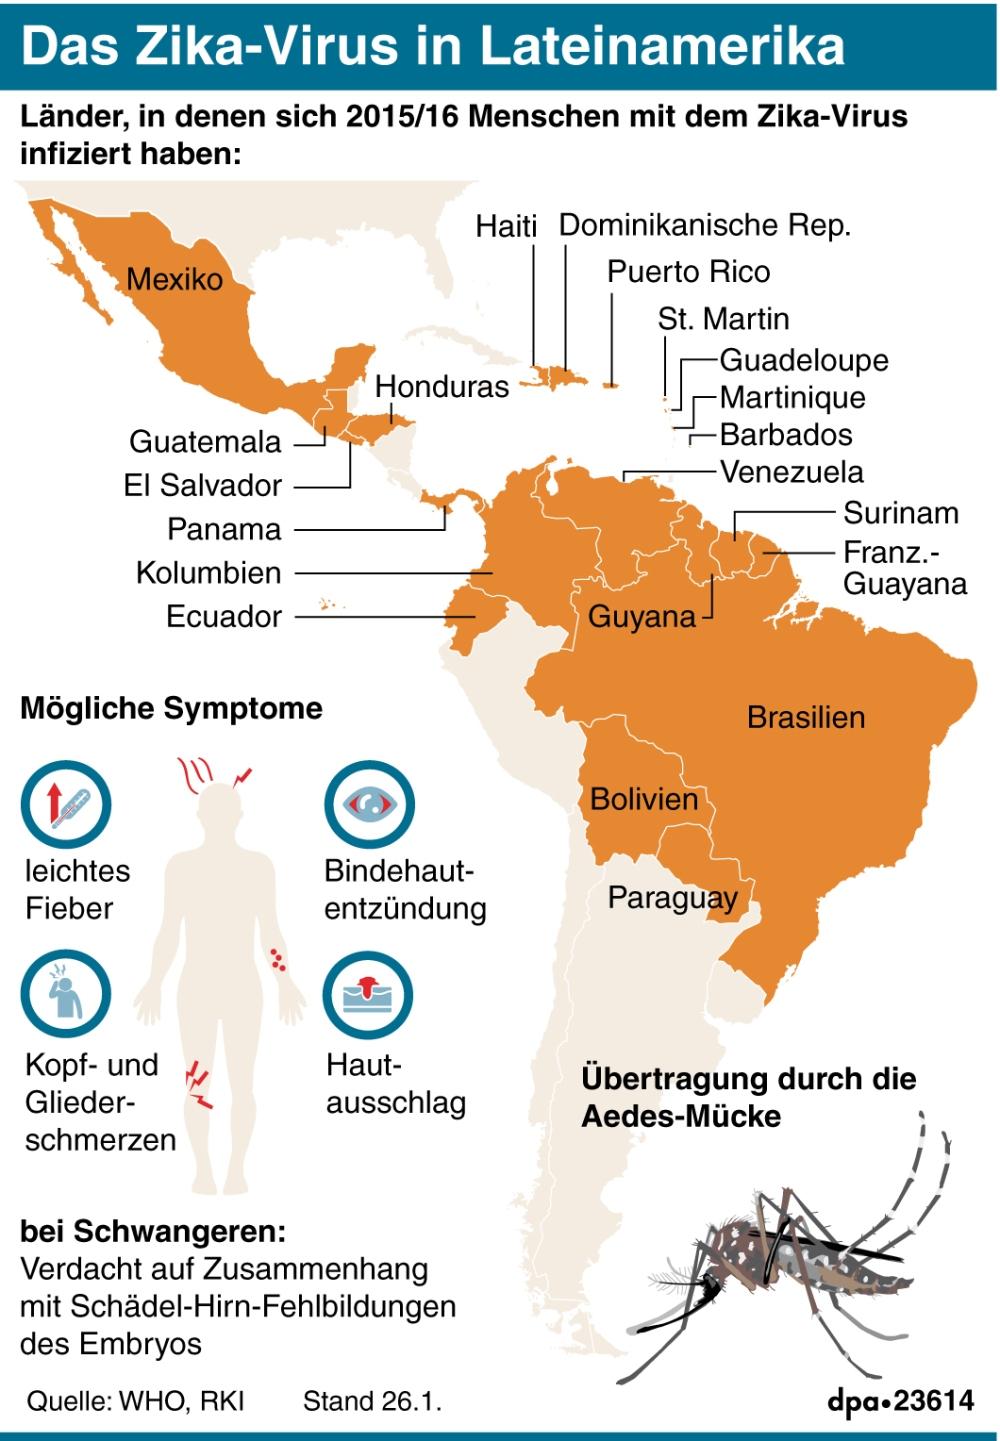 Das Zika-Virus in Lateinamerika (Wiederholung) (27.01.2016)